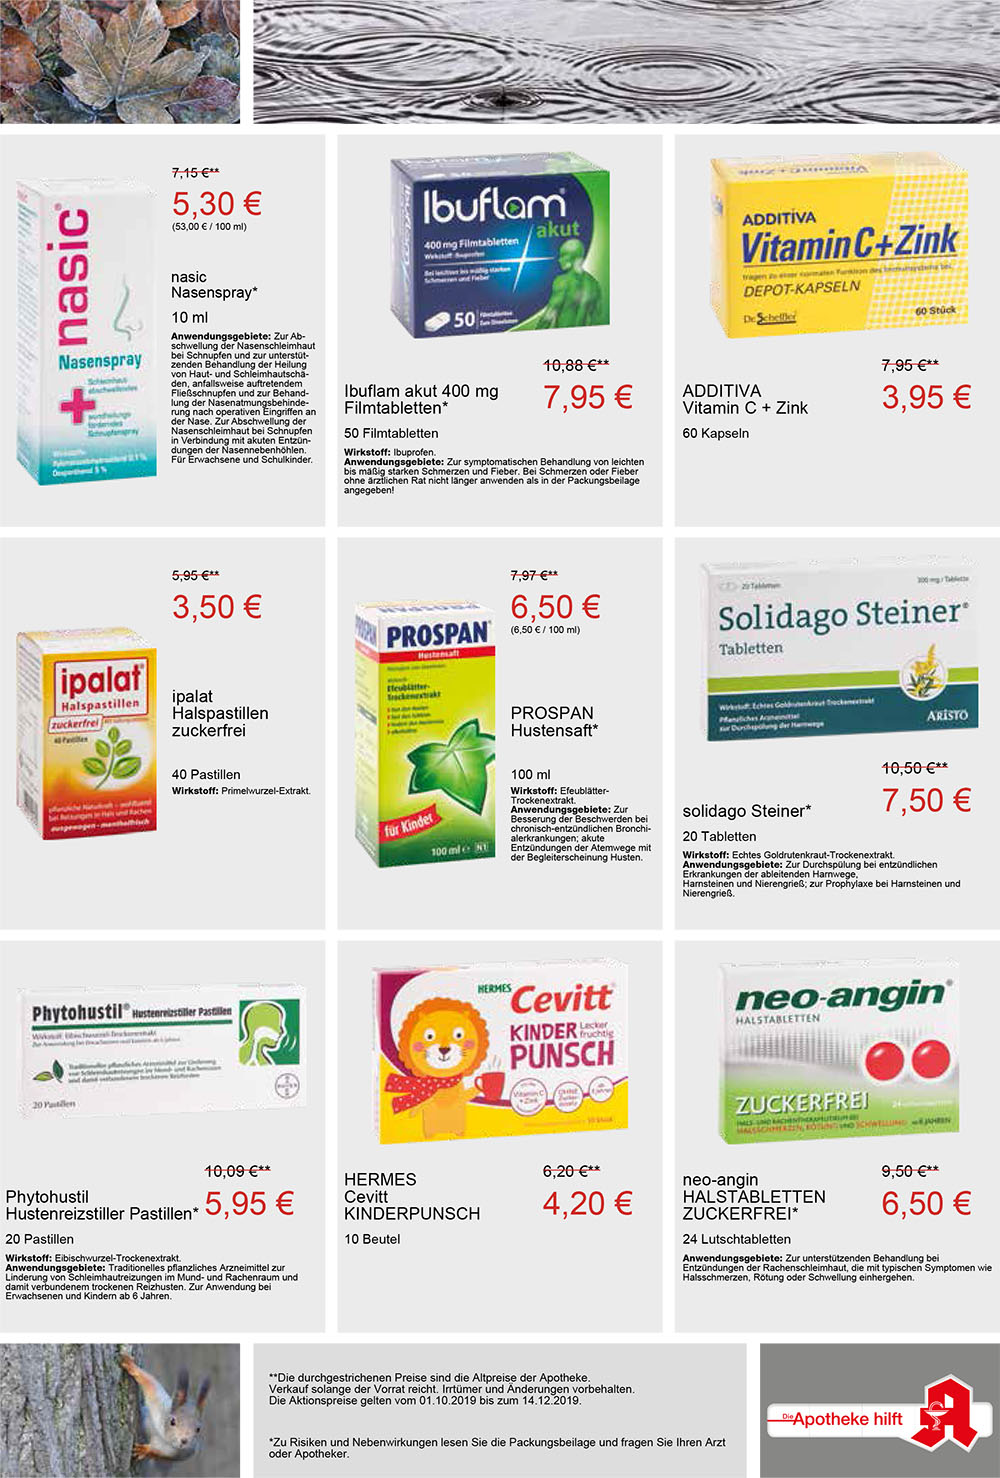 http://www.apotheken.de/fileadmin/clubarea/00000-Angebote/47178_1419_vierlinden_angebot_1.jpg